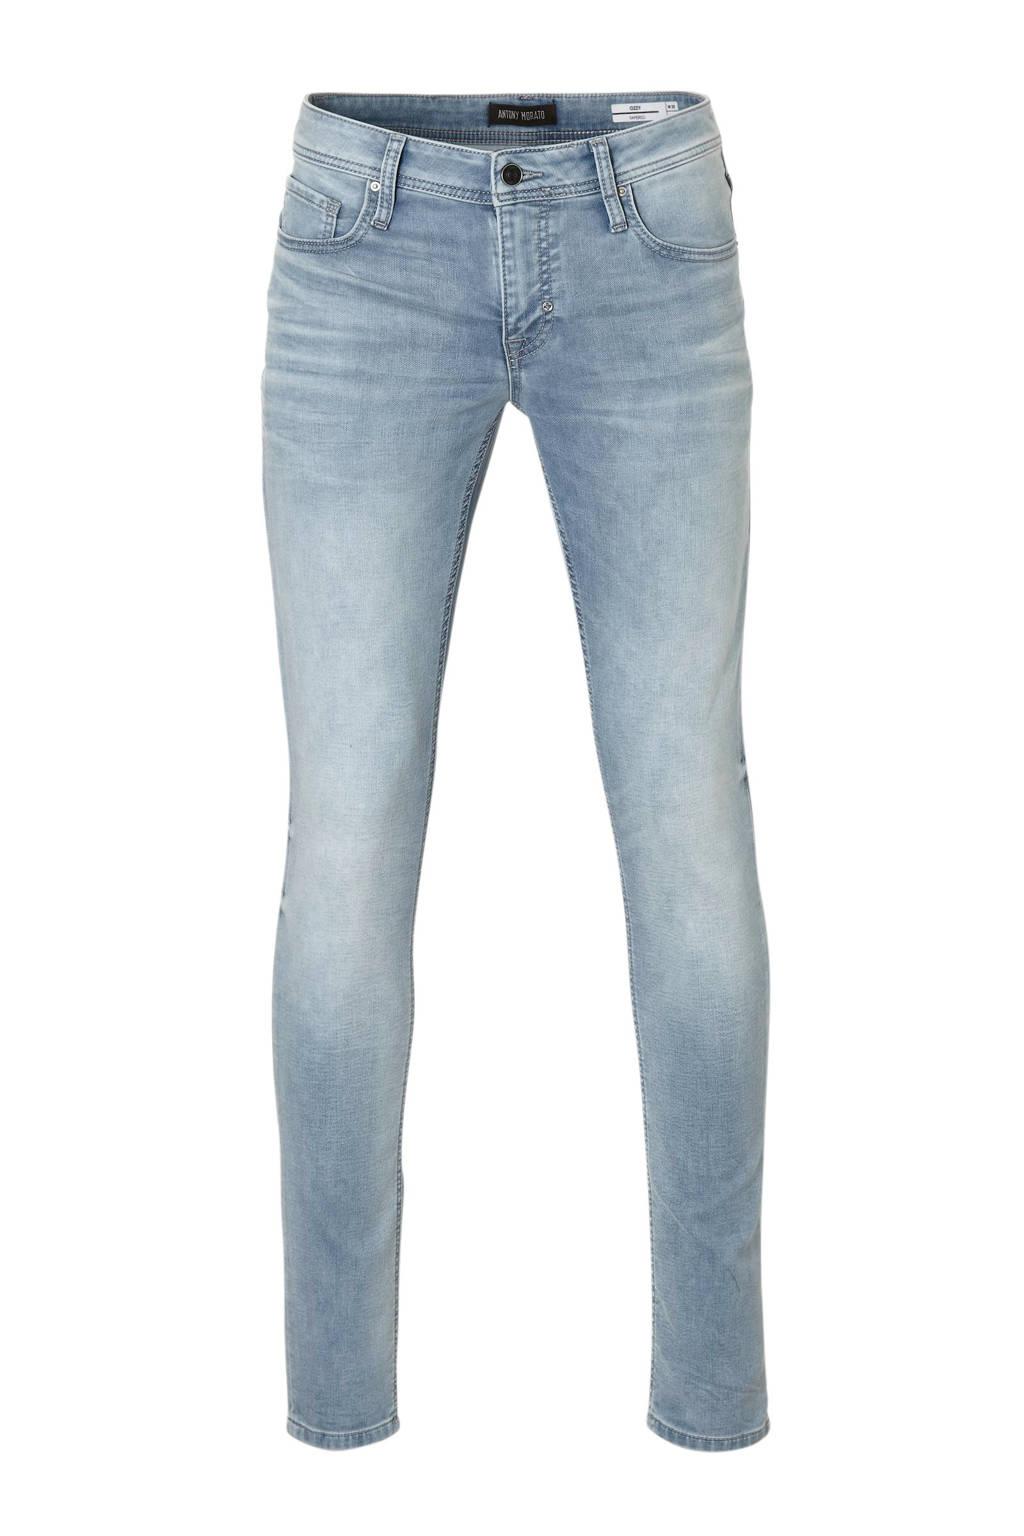 Antony Morato tapered fit jeans Ozzy Flag, Light denim